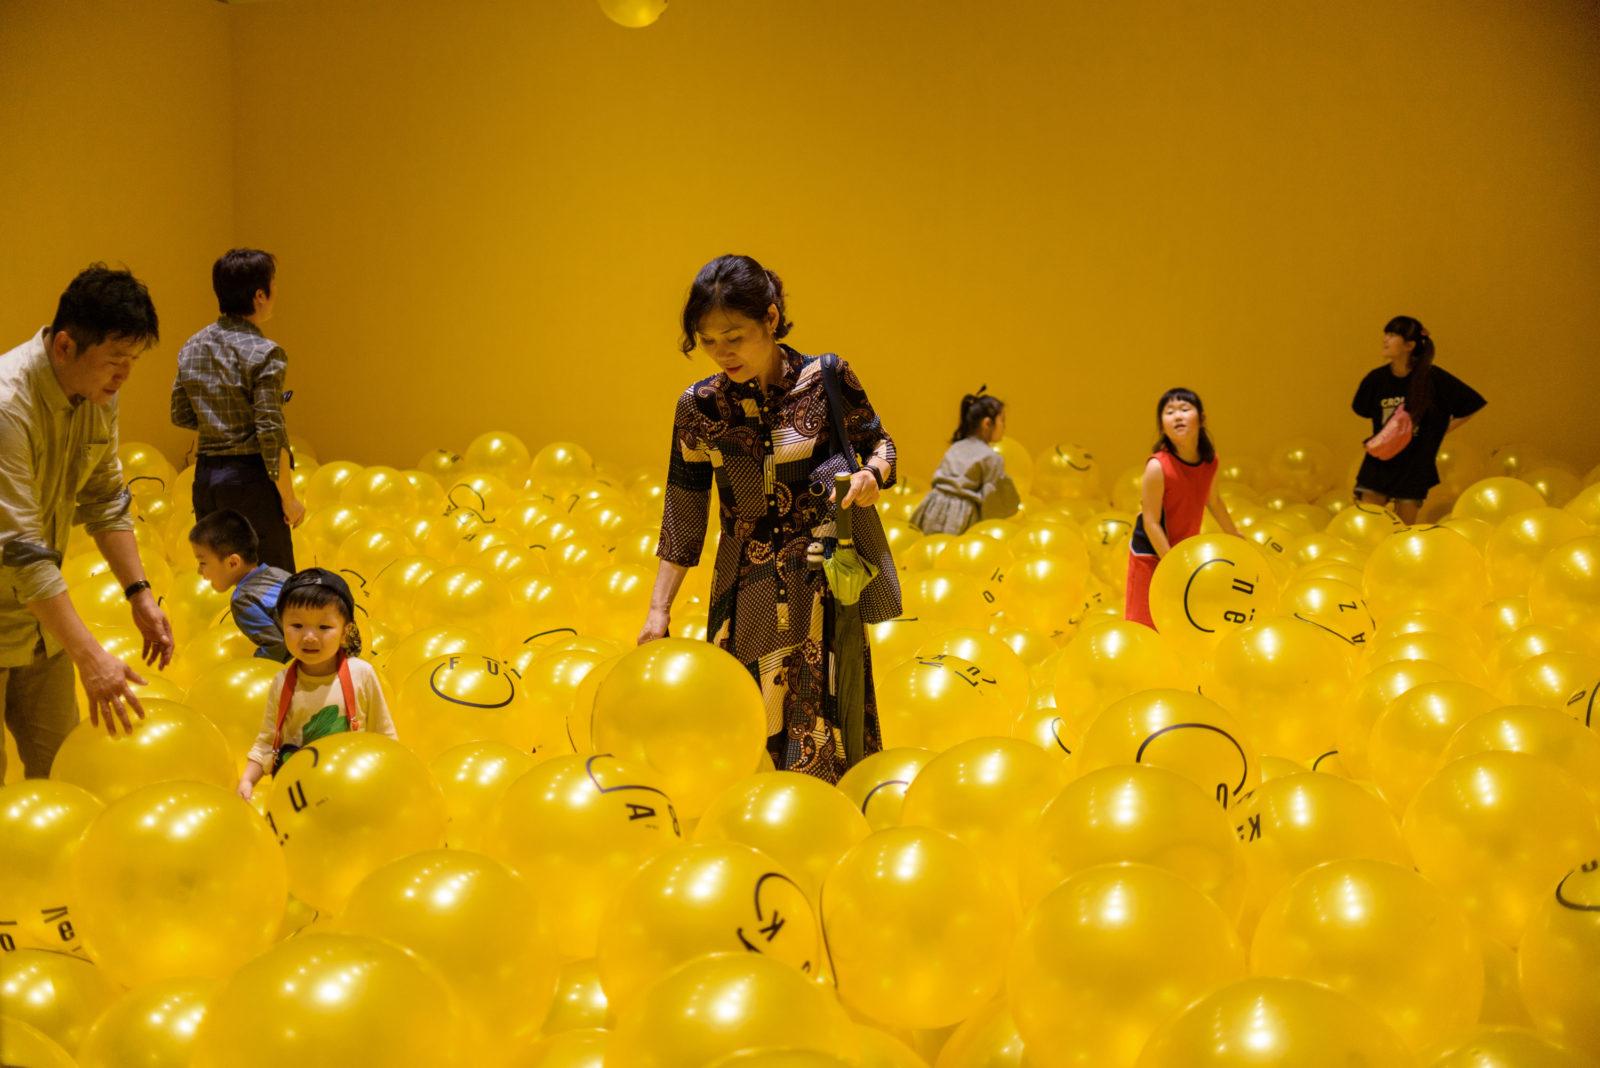 Magyar tervező pakolta tele sárga fejekkel a Gwangju Design Biennalét